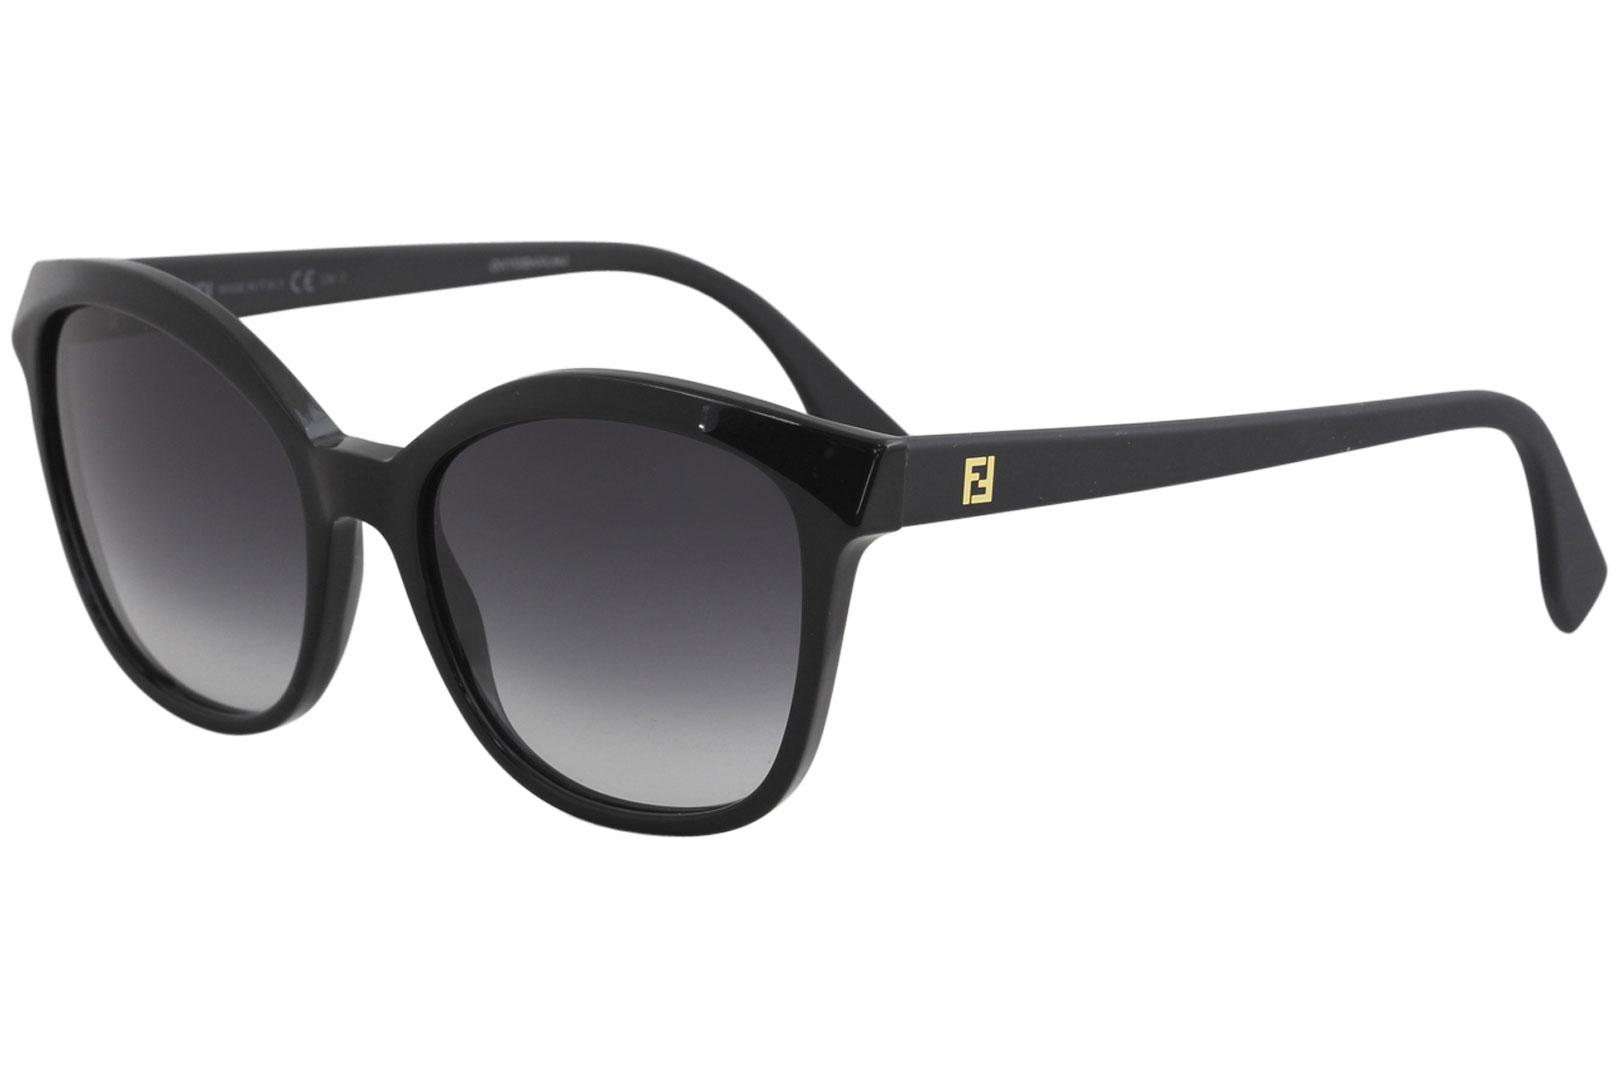 Fendi Women's FF0043/S FF/0043/S Fashion Cat Eye Sunglasses